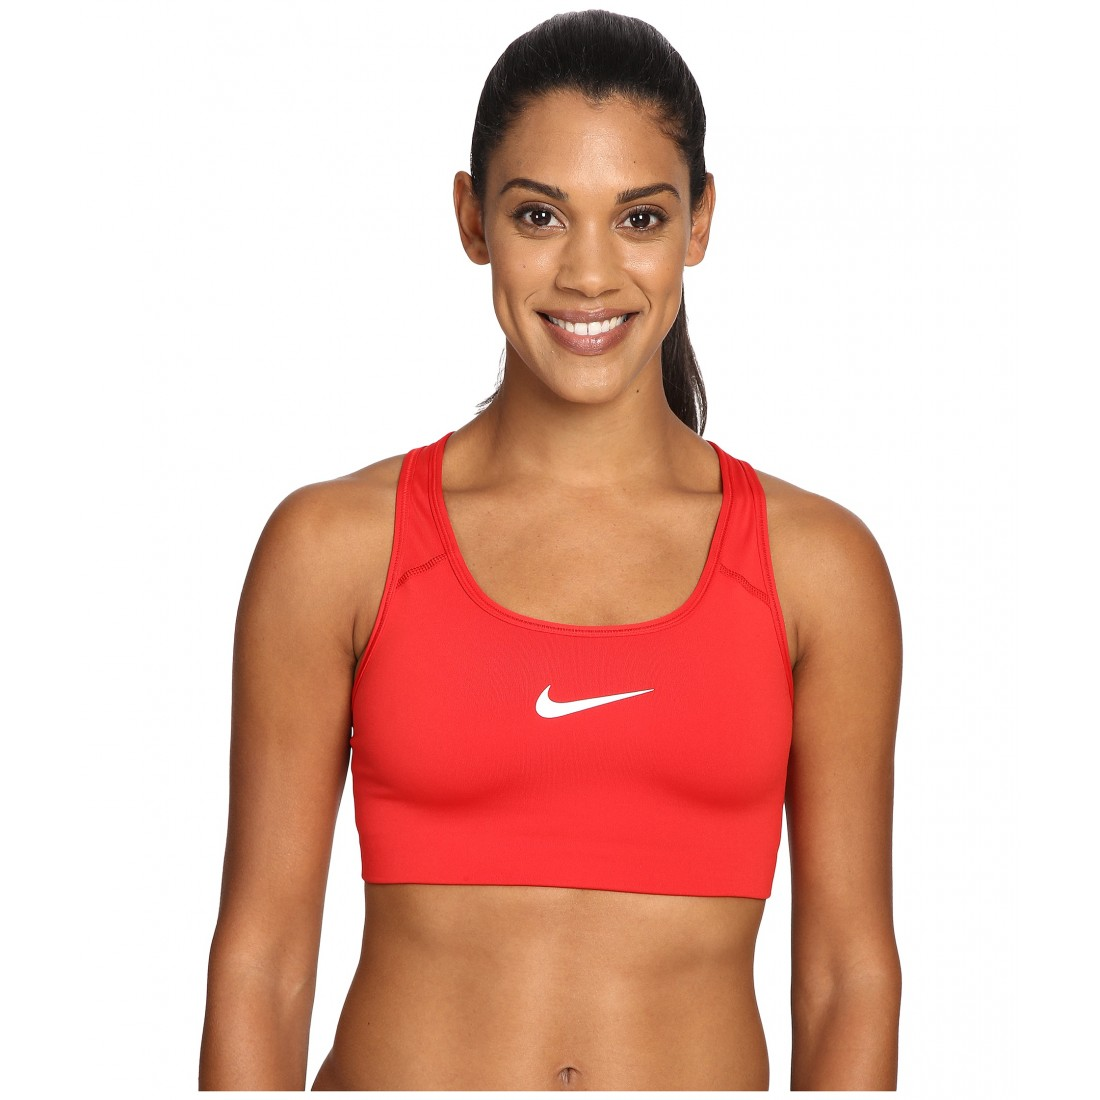 Nike Pro Classic Swoosh Sports Bra Bra4her Zpsku 8717537 University Red White